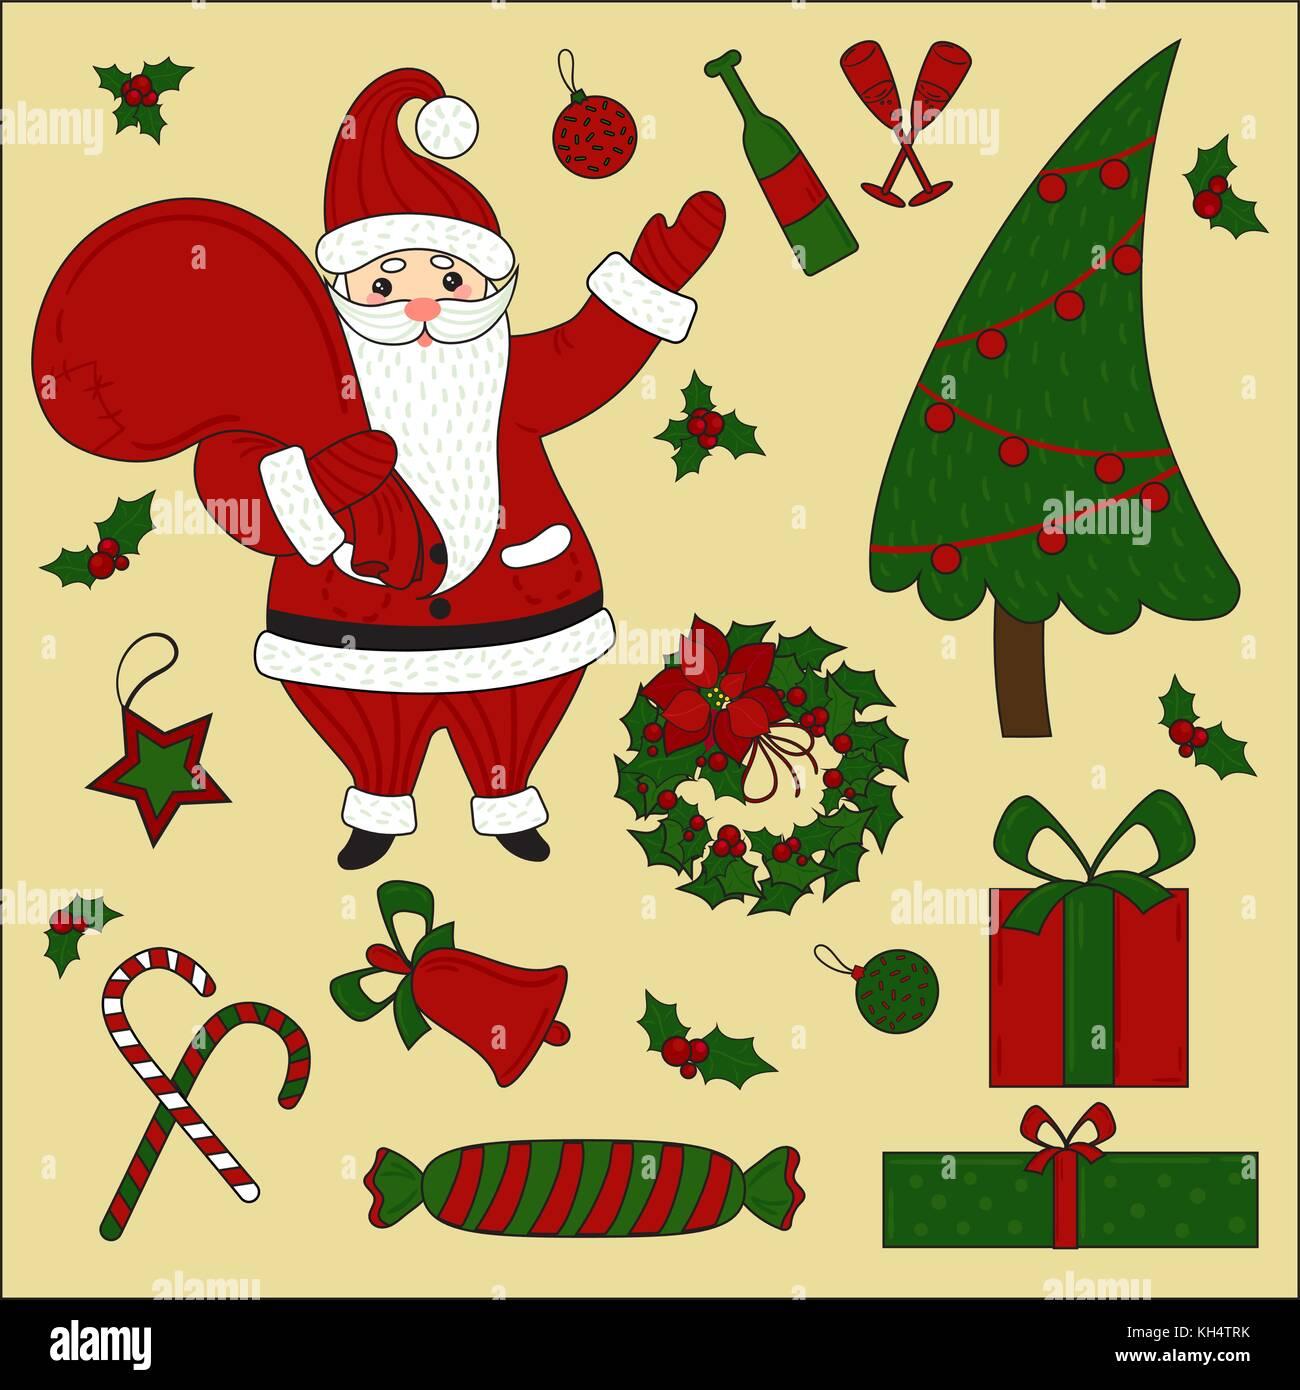 Christmas Items.Christmas Items And Santa Set New Year Stock Vector Art